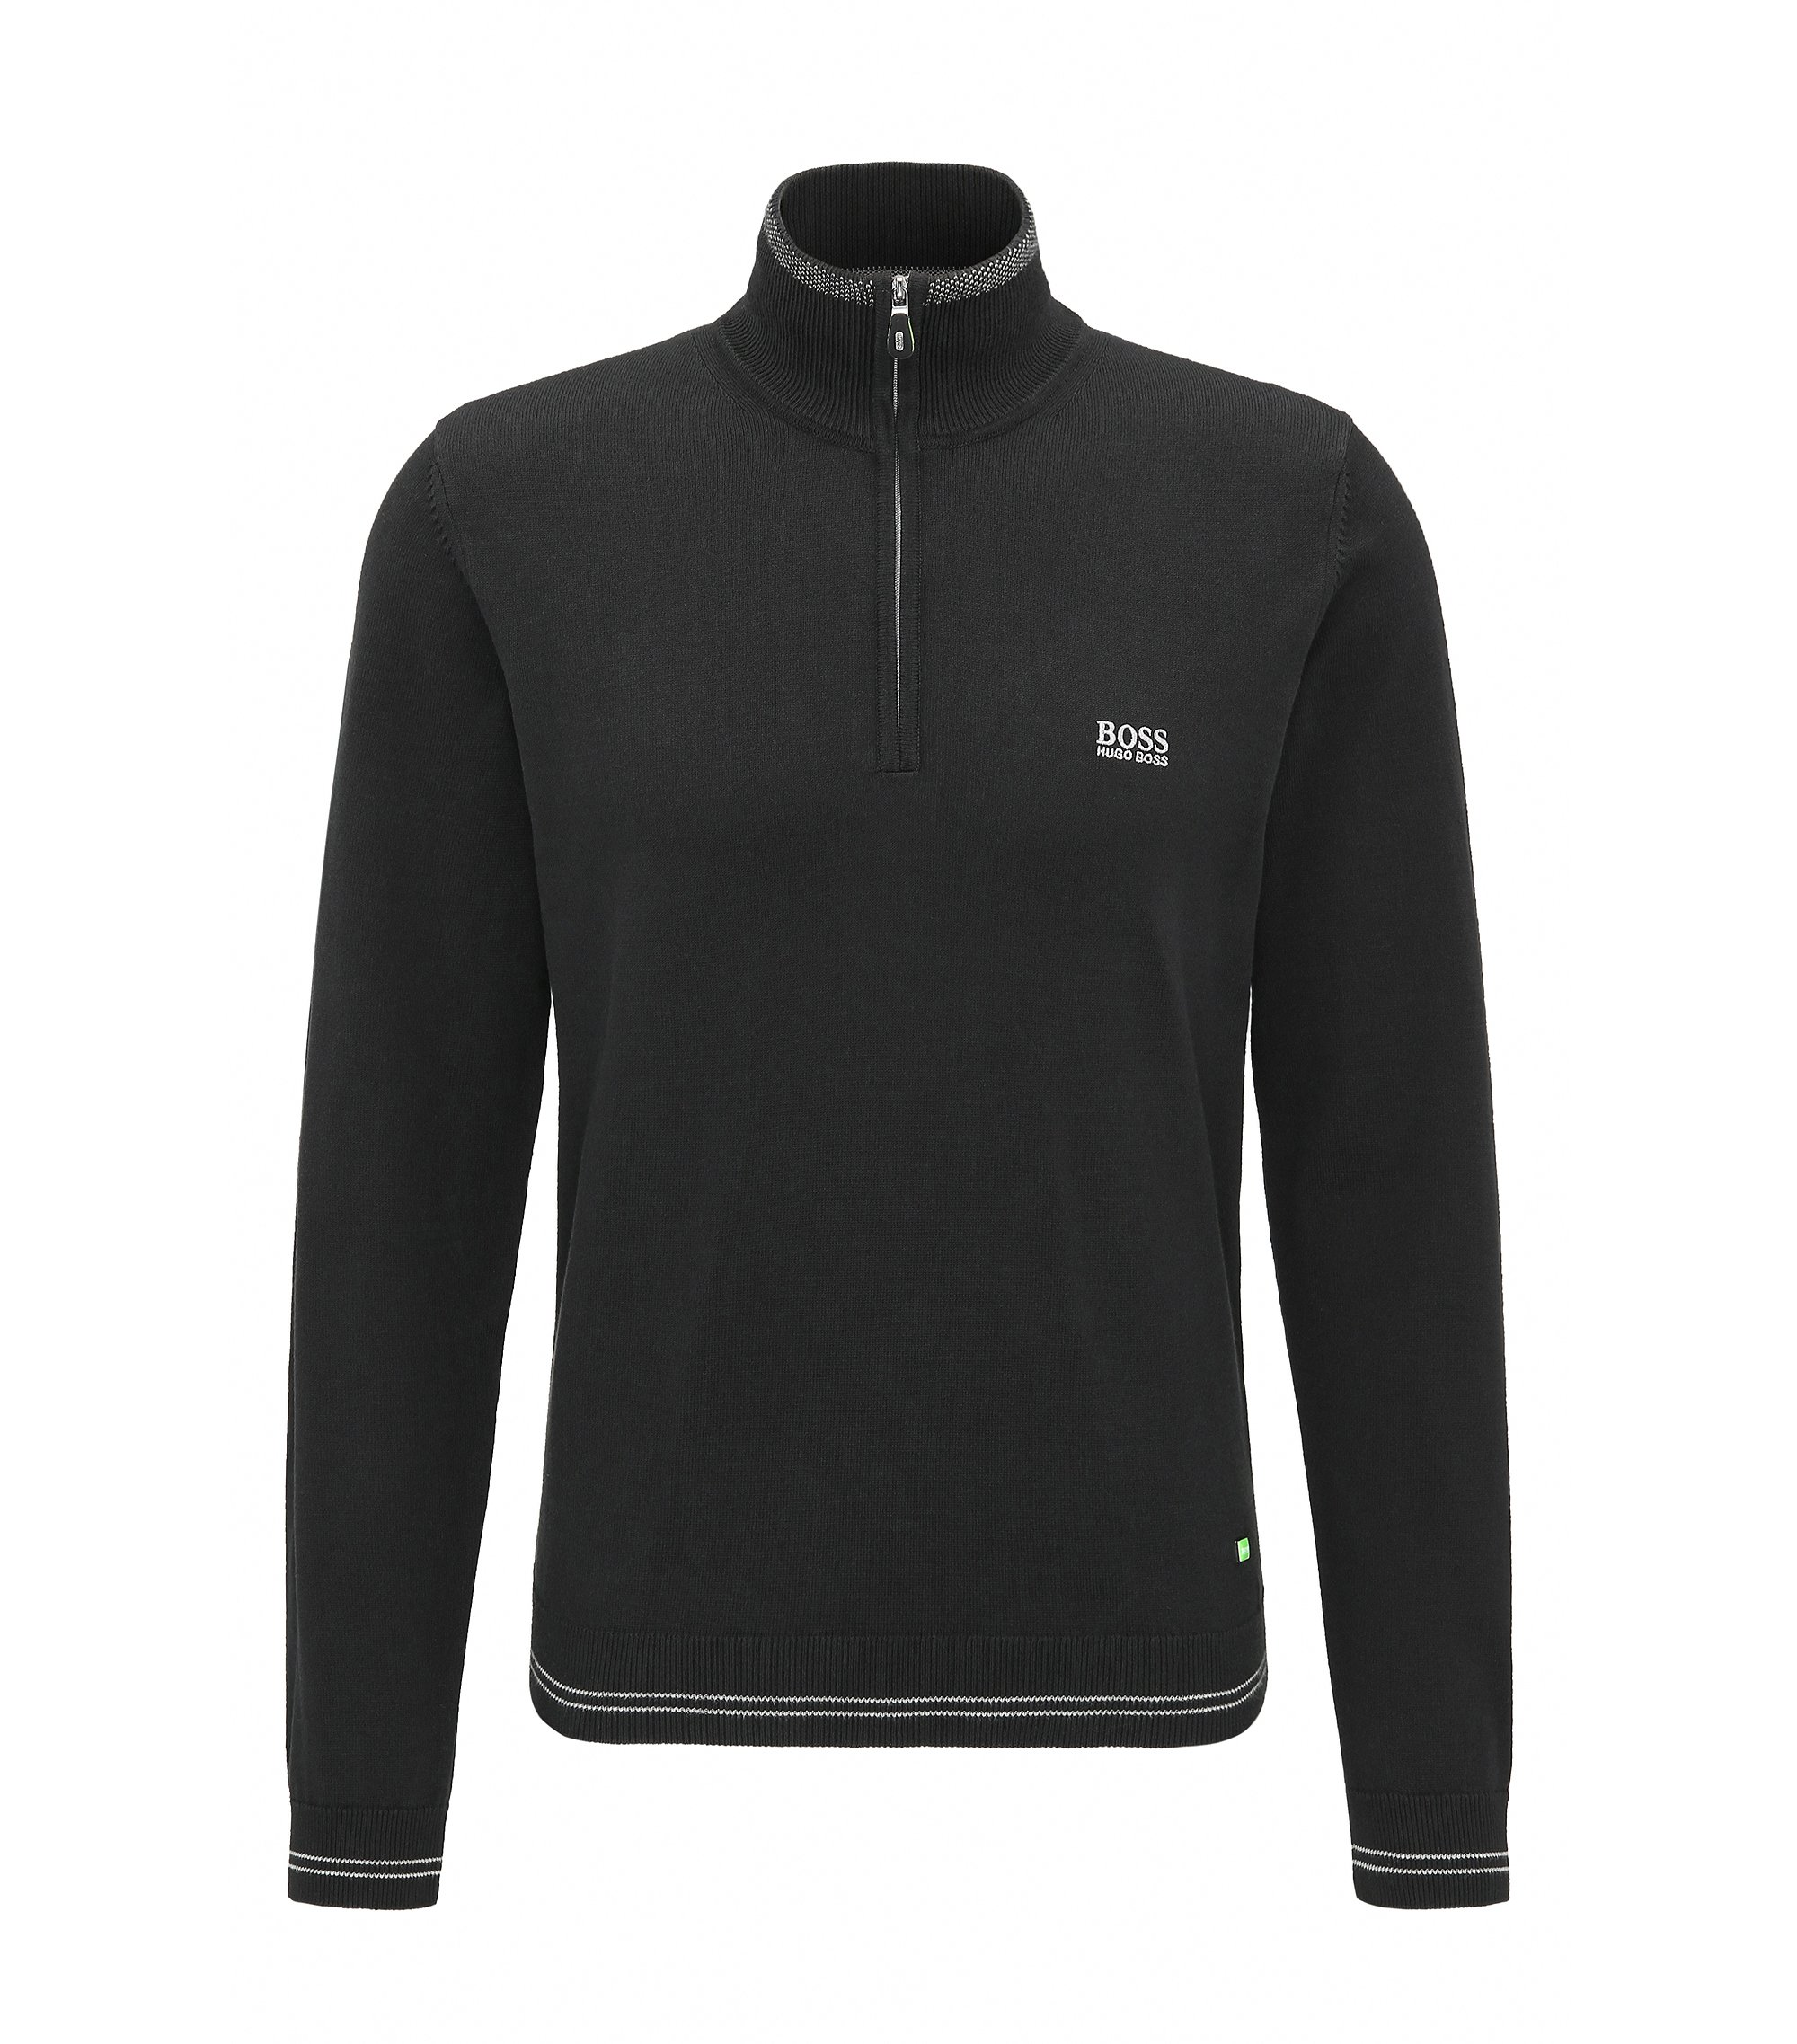 Cotton Blend Half-Zip Sweater | Zime W17, Black